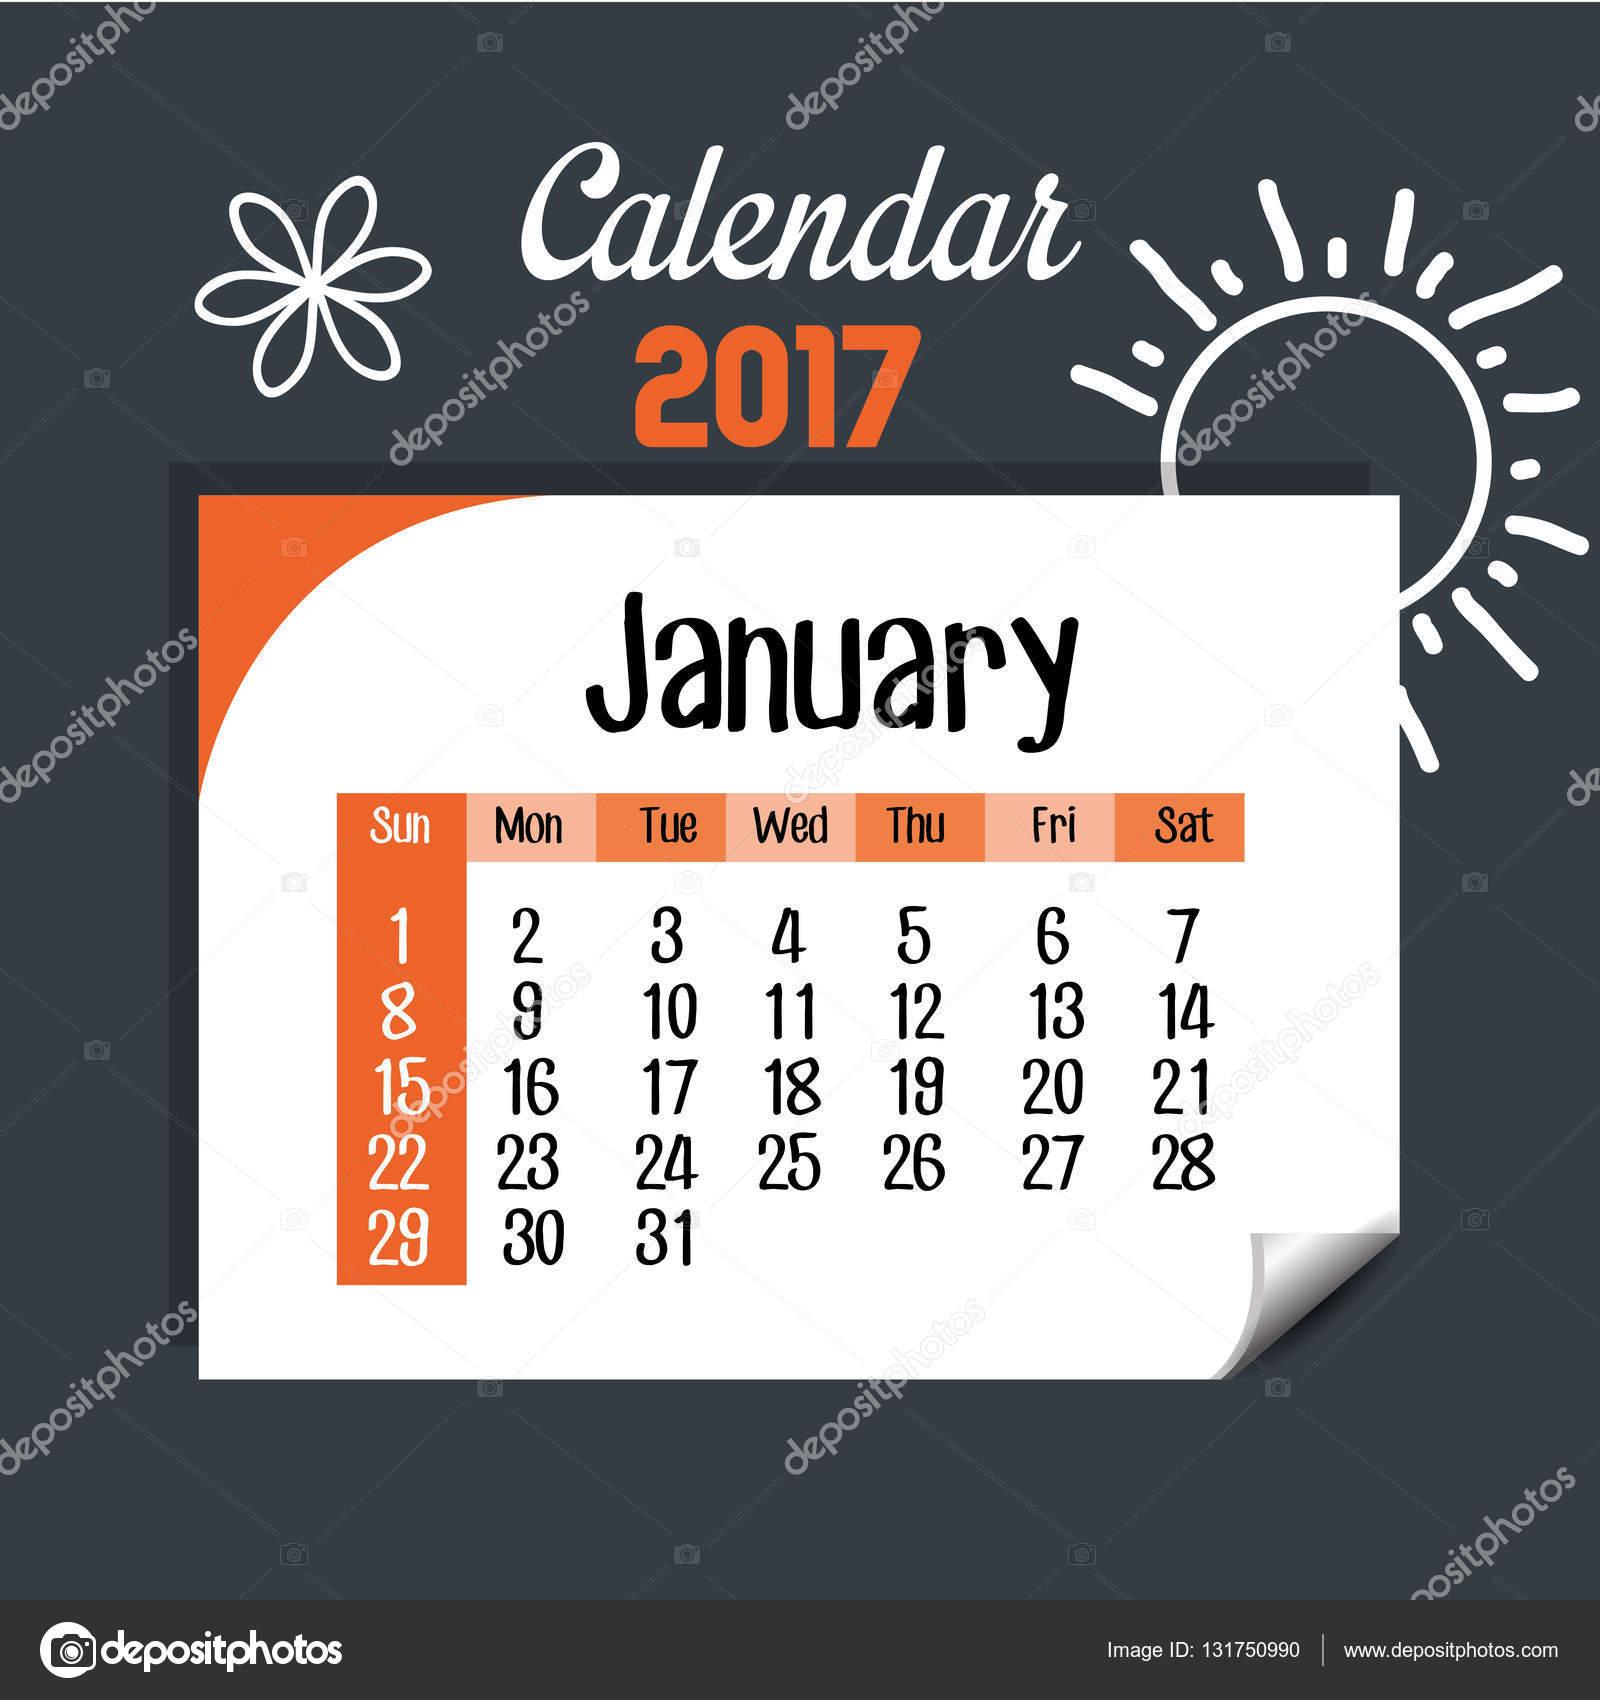 calendar january 2017 template icon stock vector yupiramos